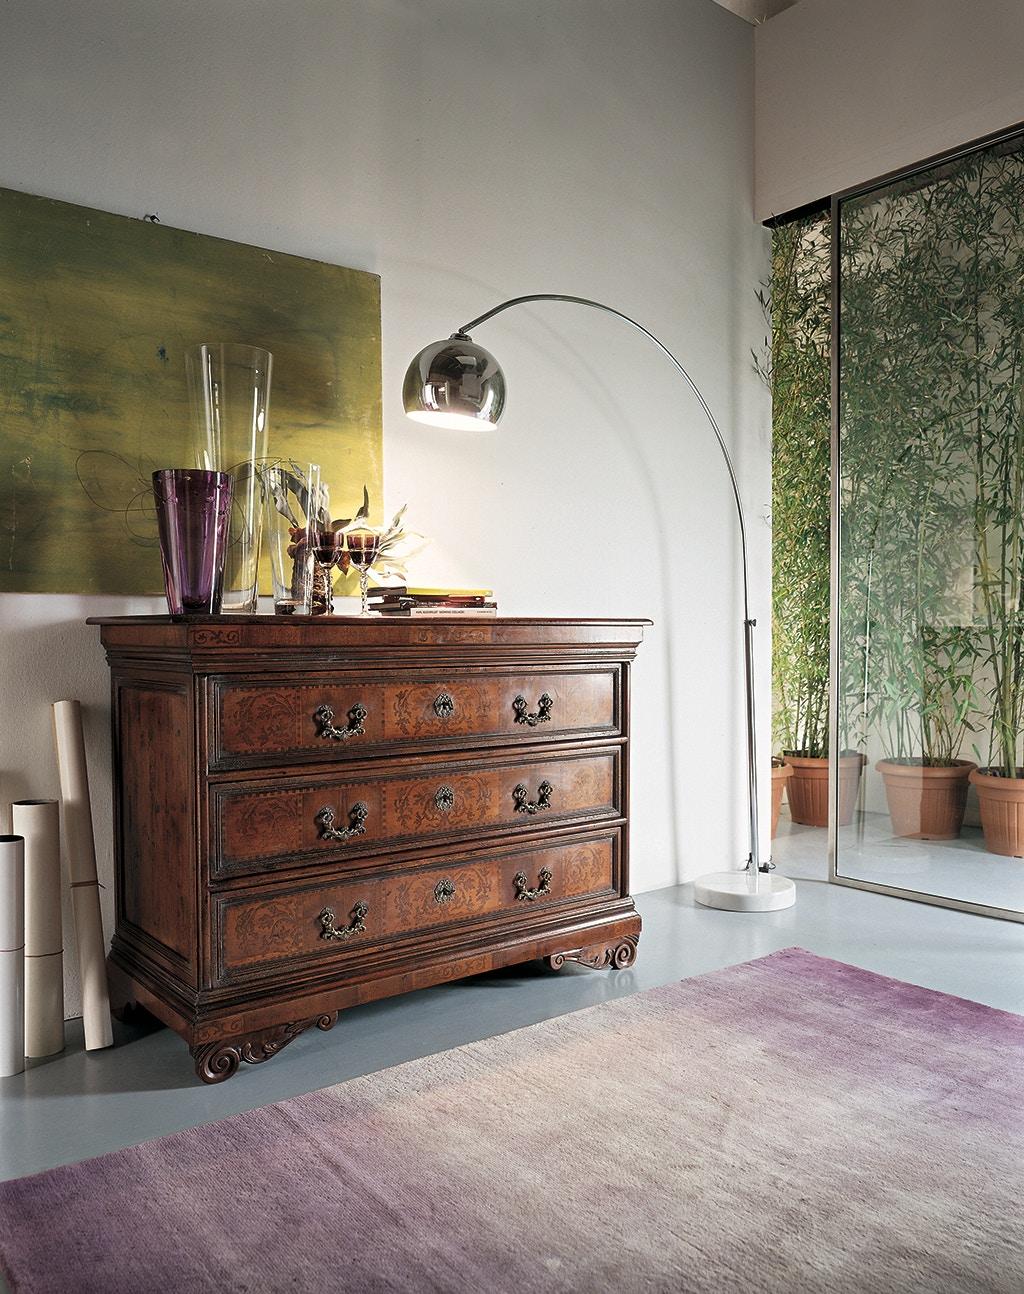 Beautiful Von Hemert Interiors Italian Imports Mfr: XI45 Chest #830